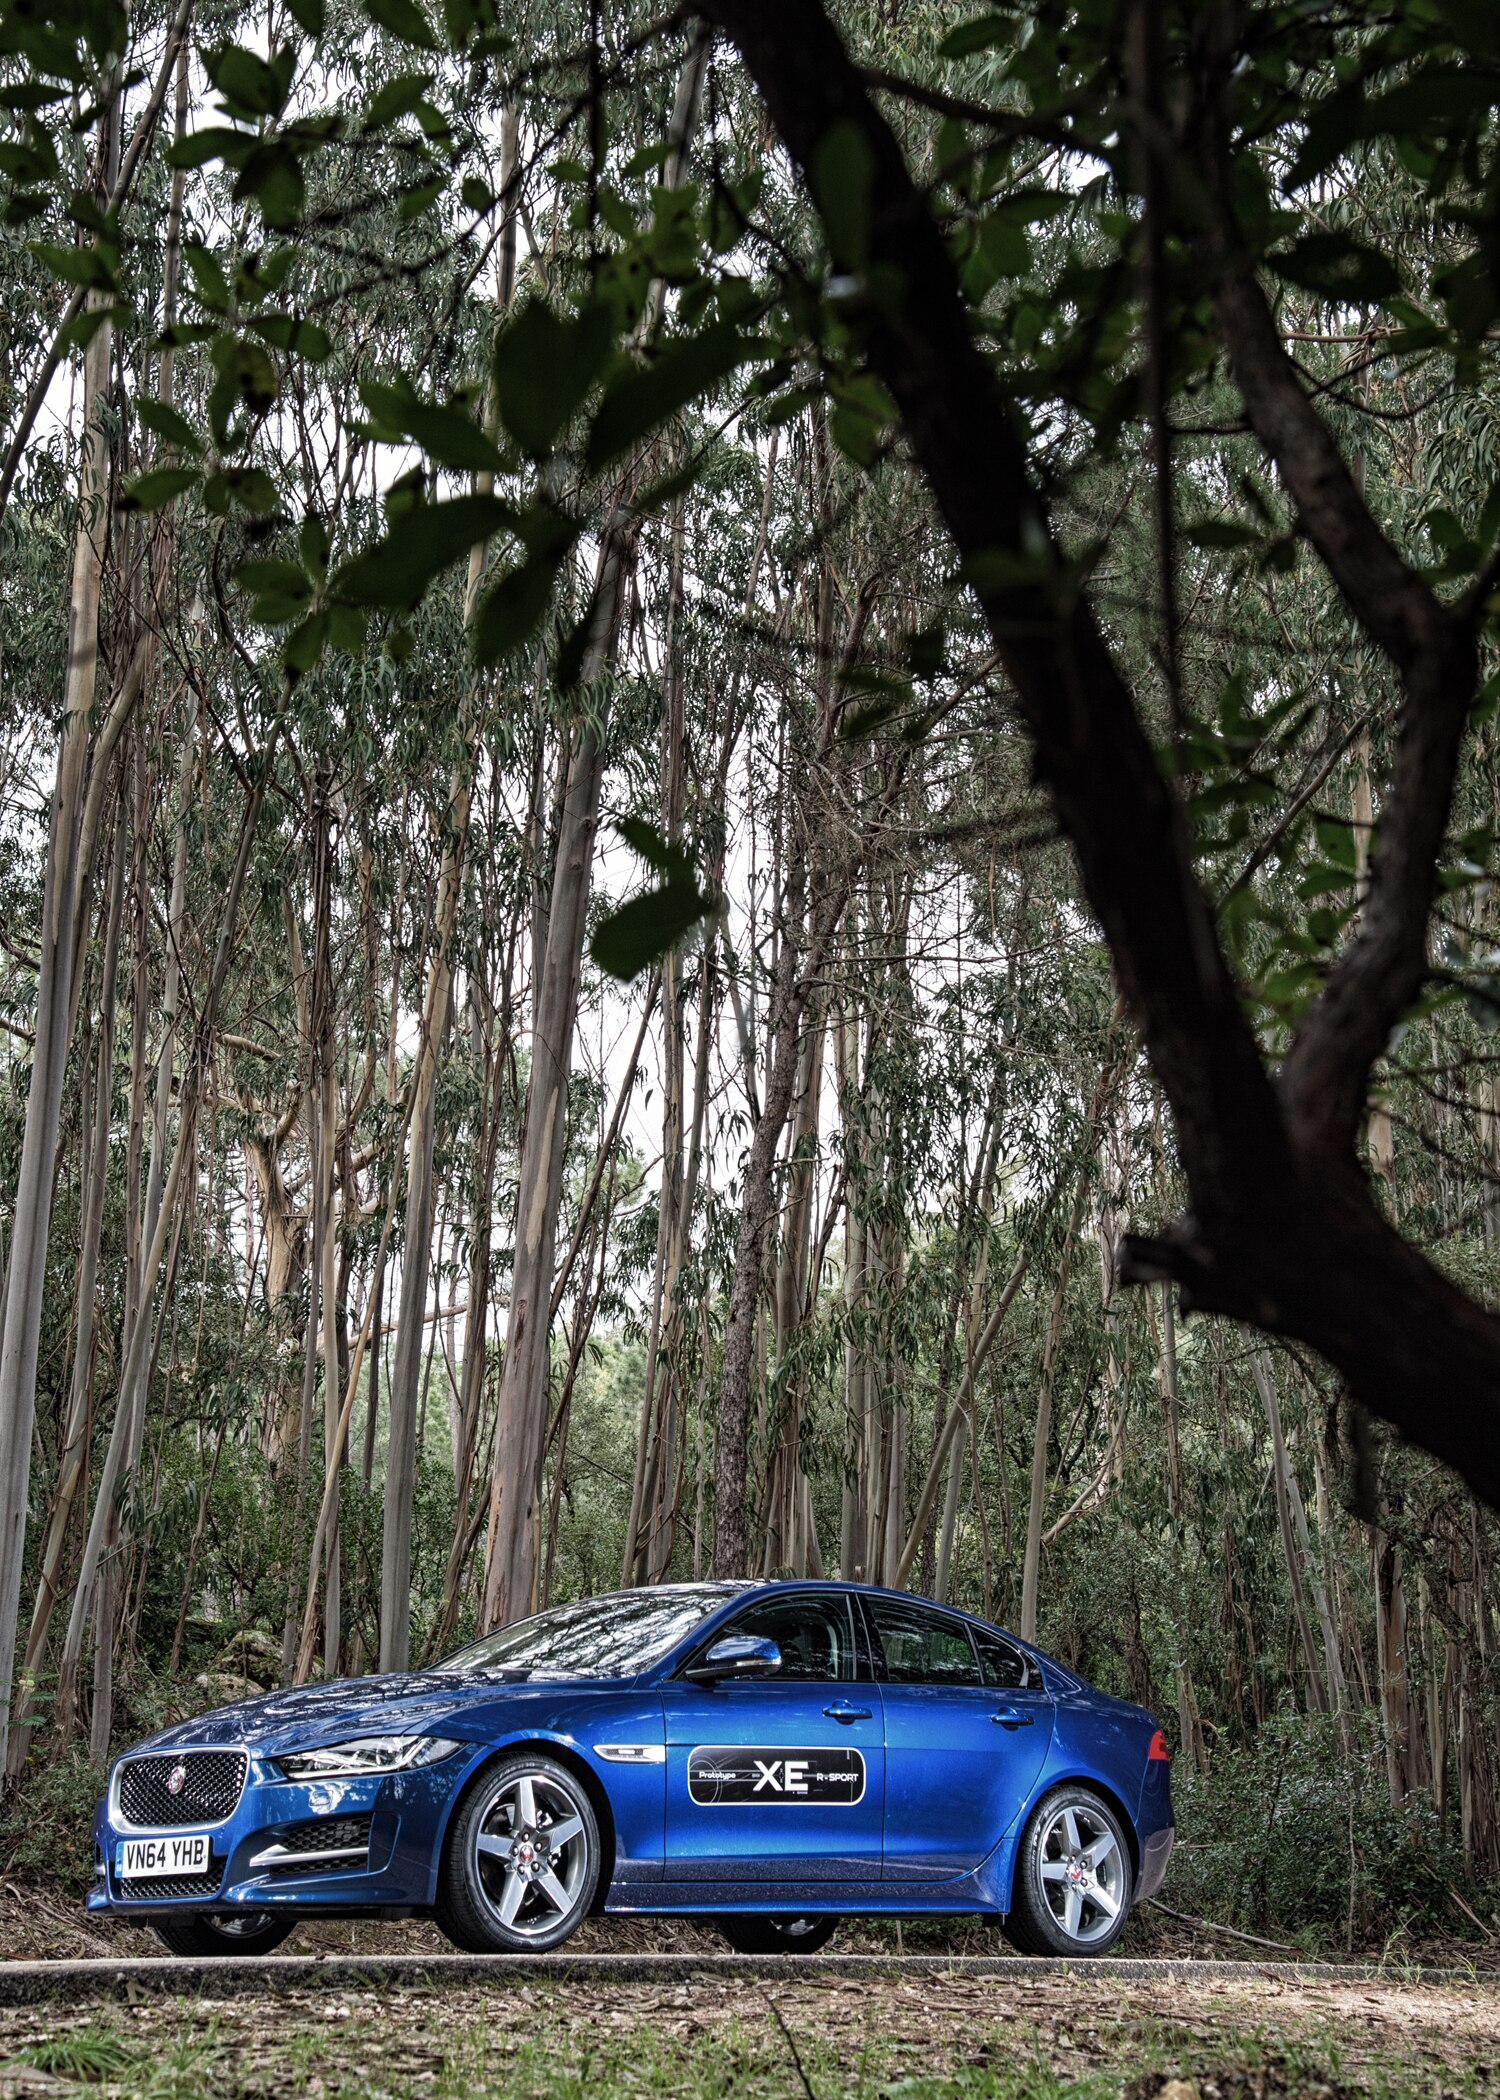 2017 jaguar xe first drive review automobile magazine. Black Bedroom Furniture Sets. Home Design Ideas